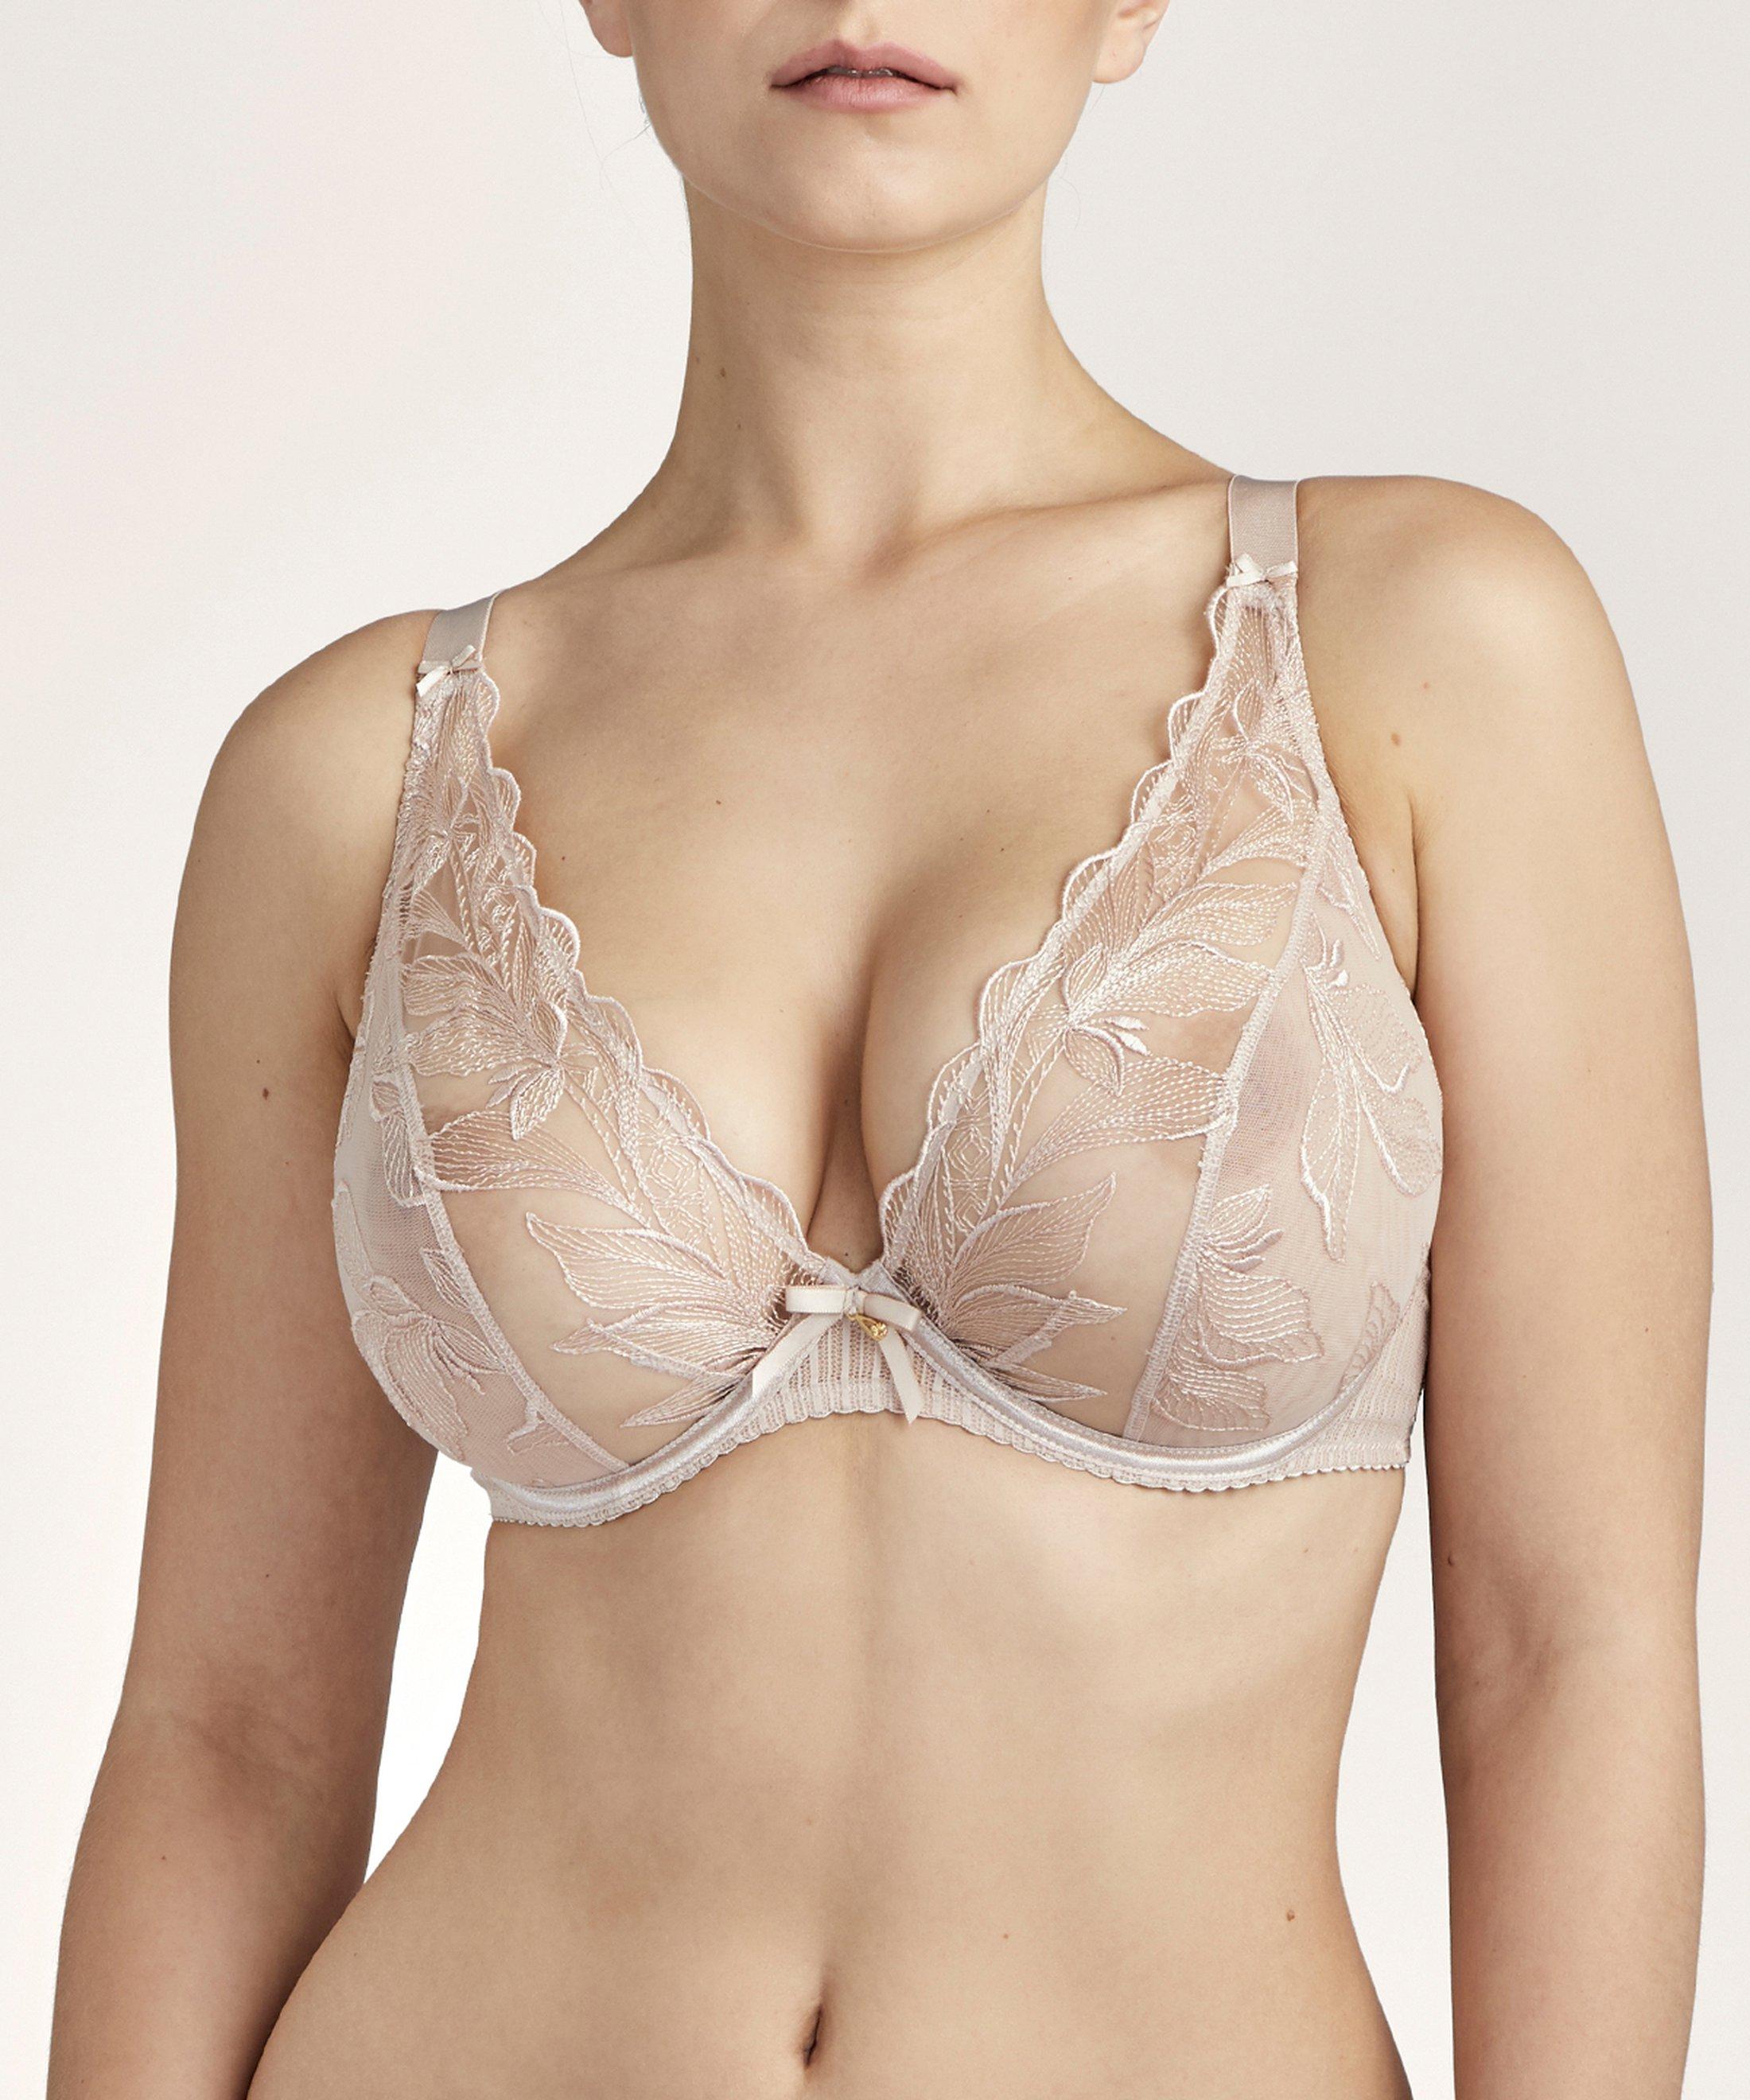 FLEUR DE TATTOO Soutien-gorge triangle avec armatures confort Nude Skin | Aubade